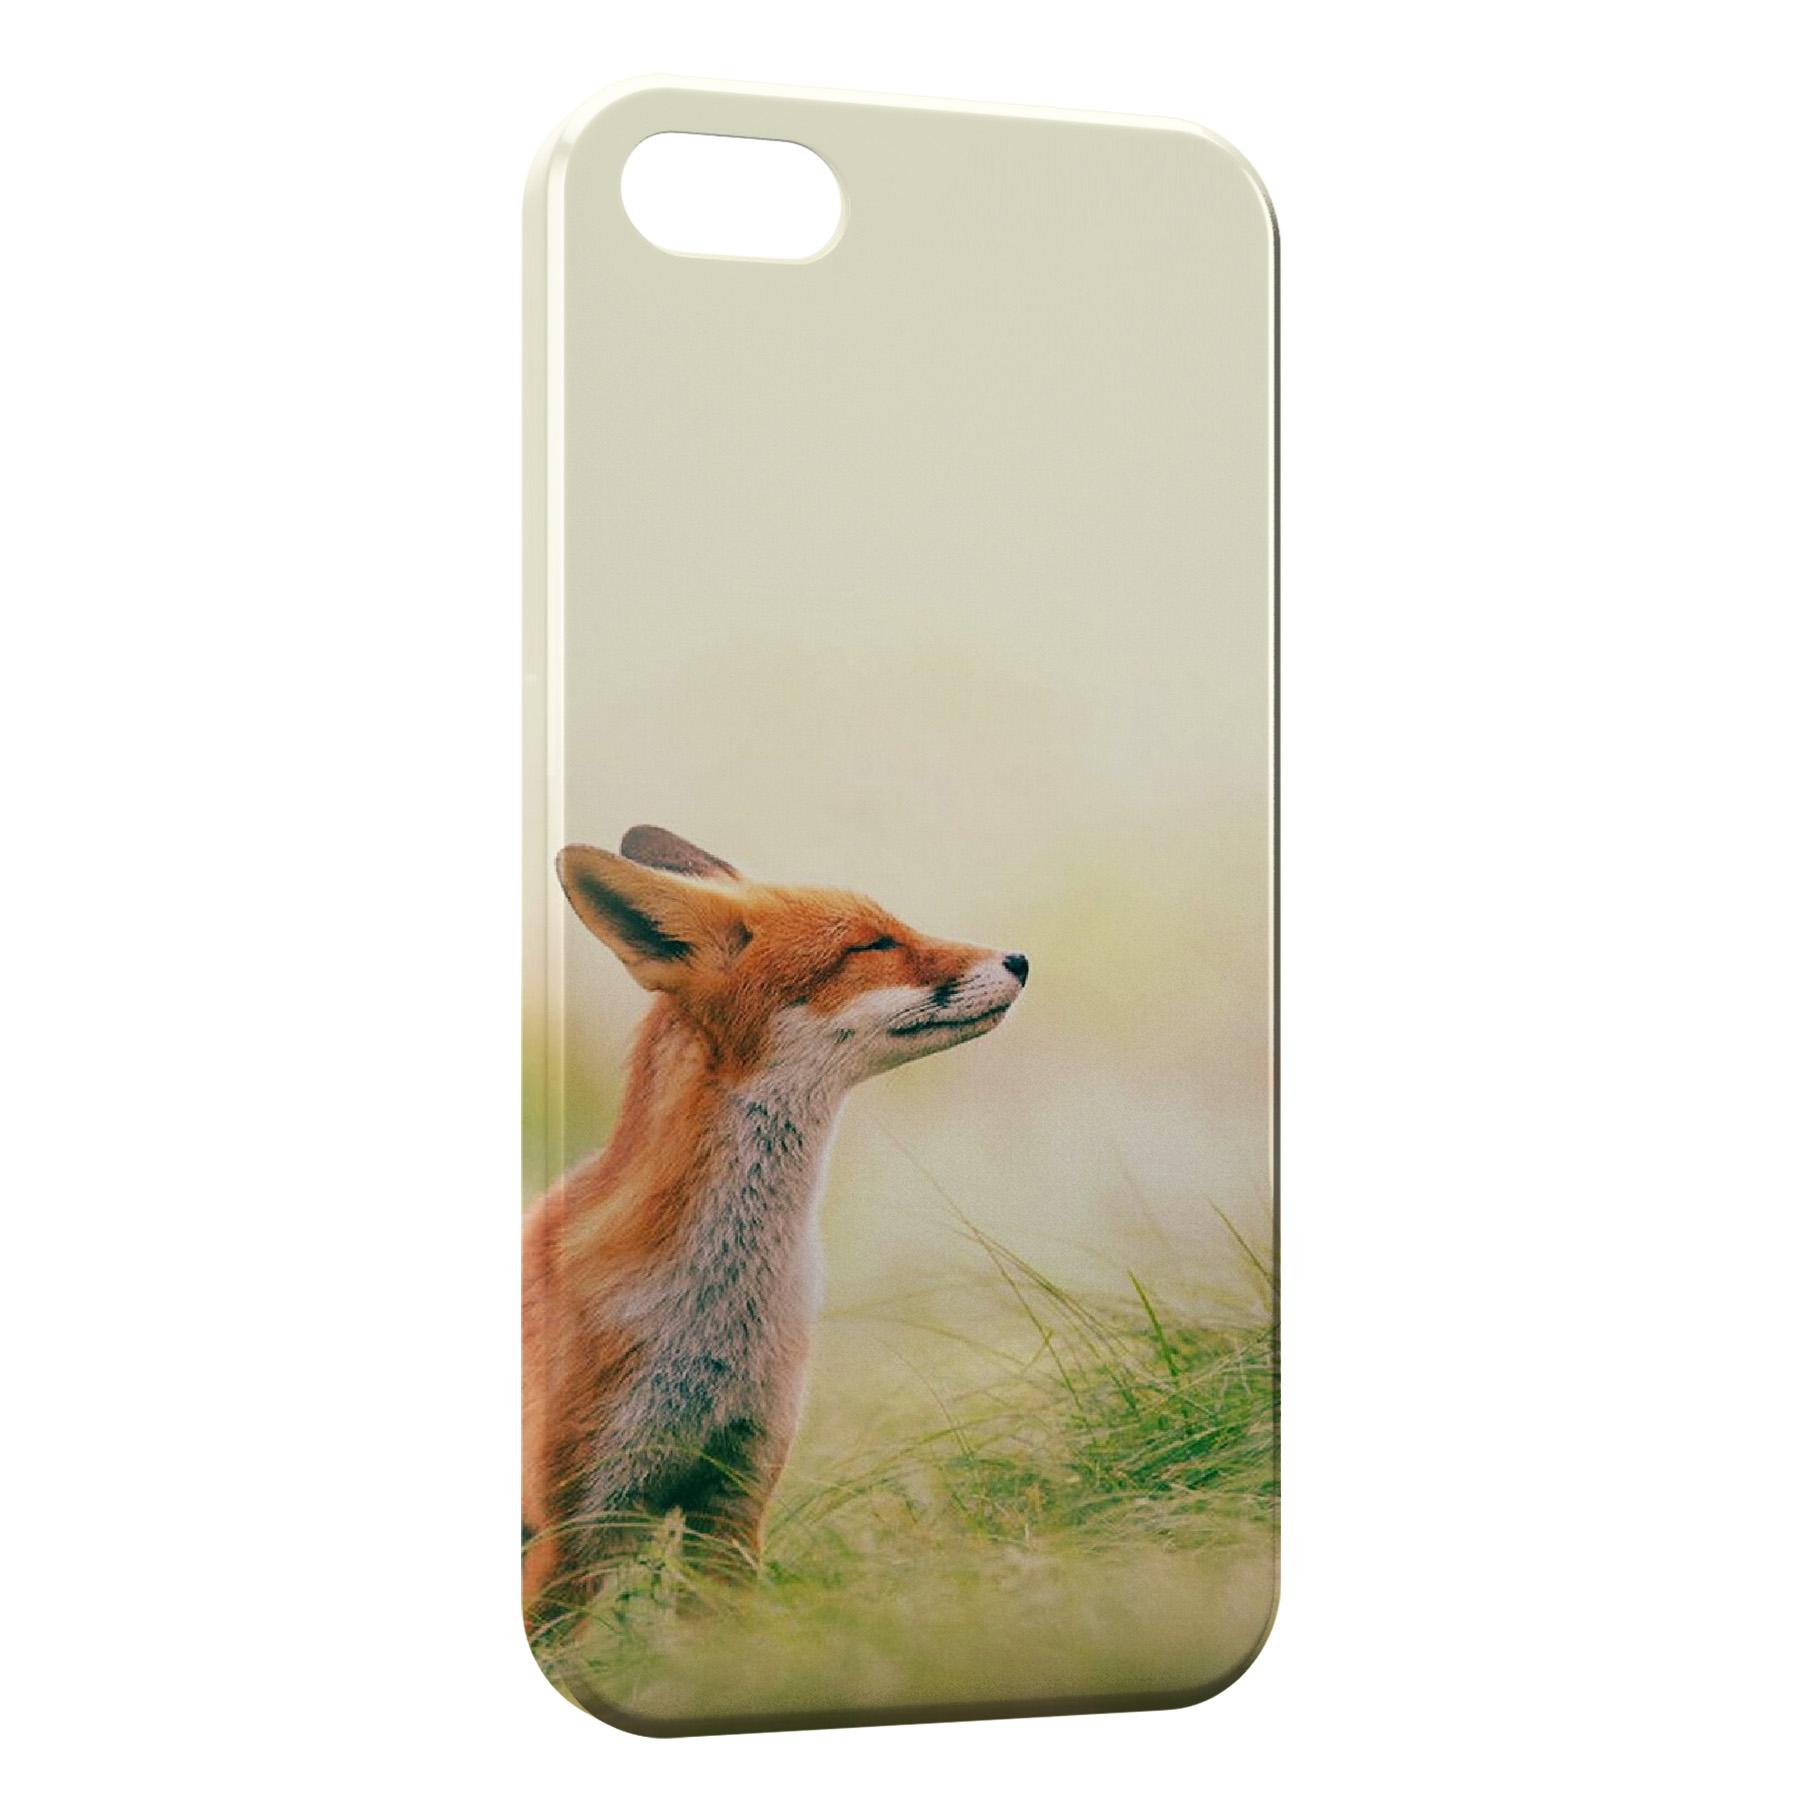 Coque iPhone 5C Cute Fox Renard 4